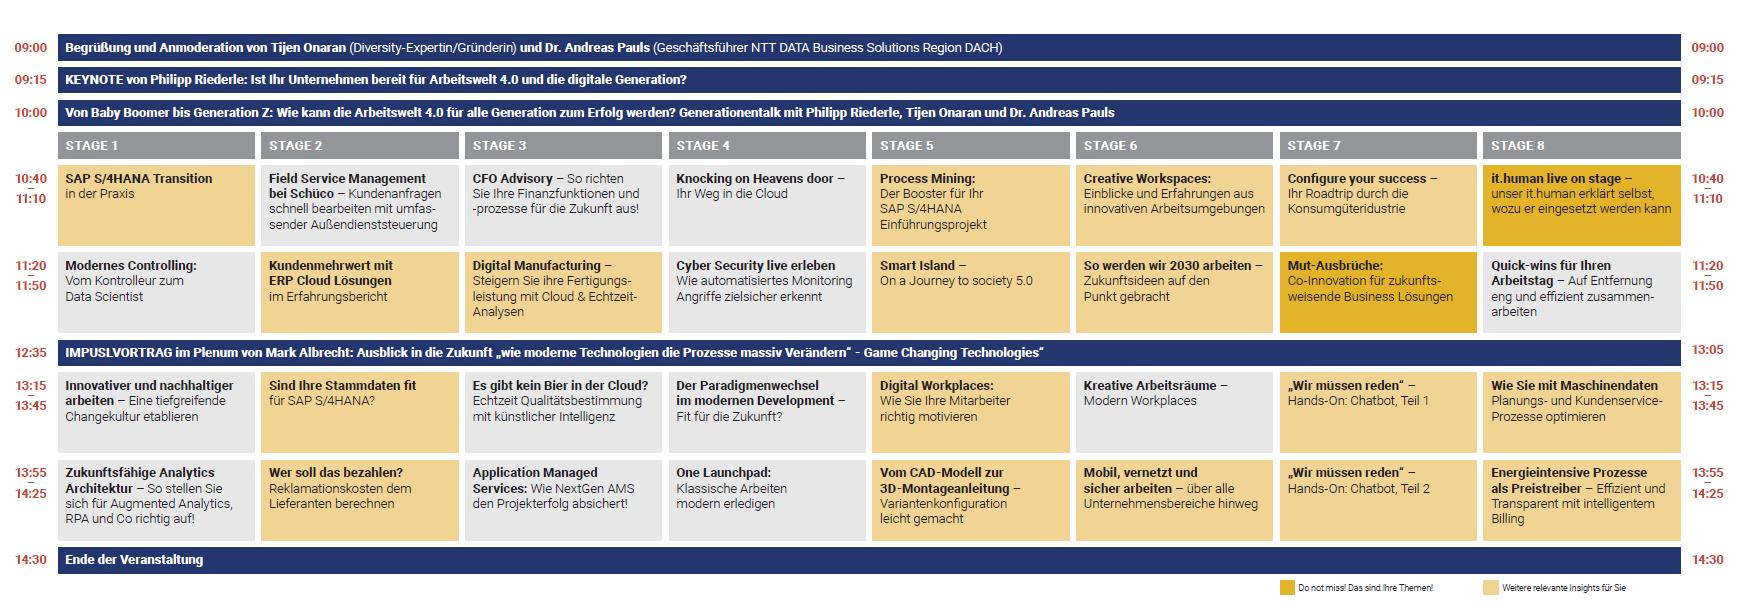 Transformation-NOW-2021-Agenda-Tag-2-Supply-Chain_210601